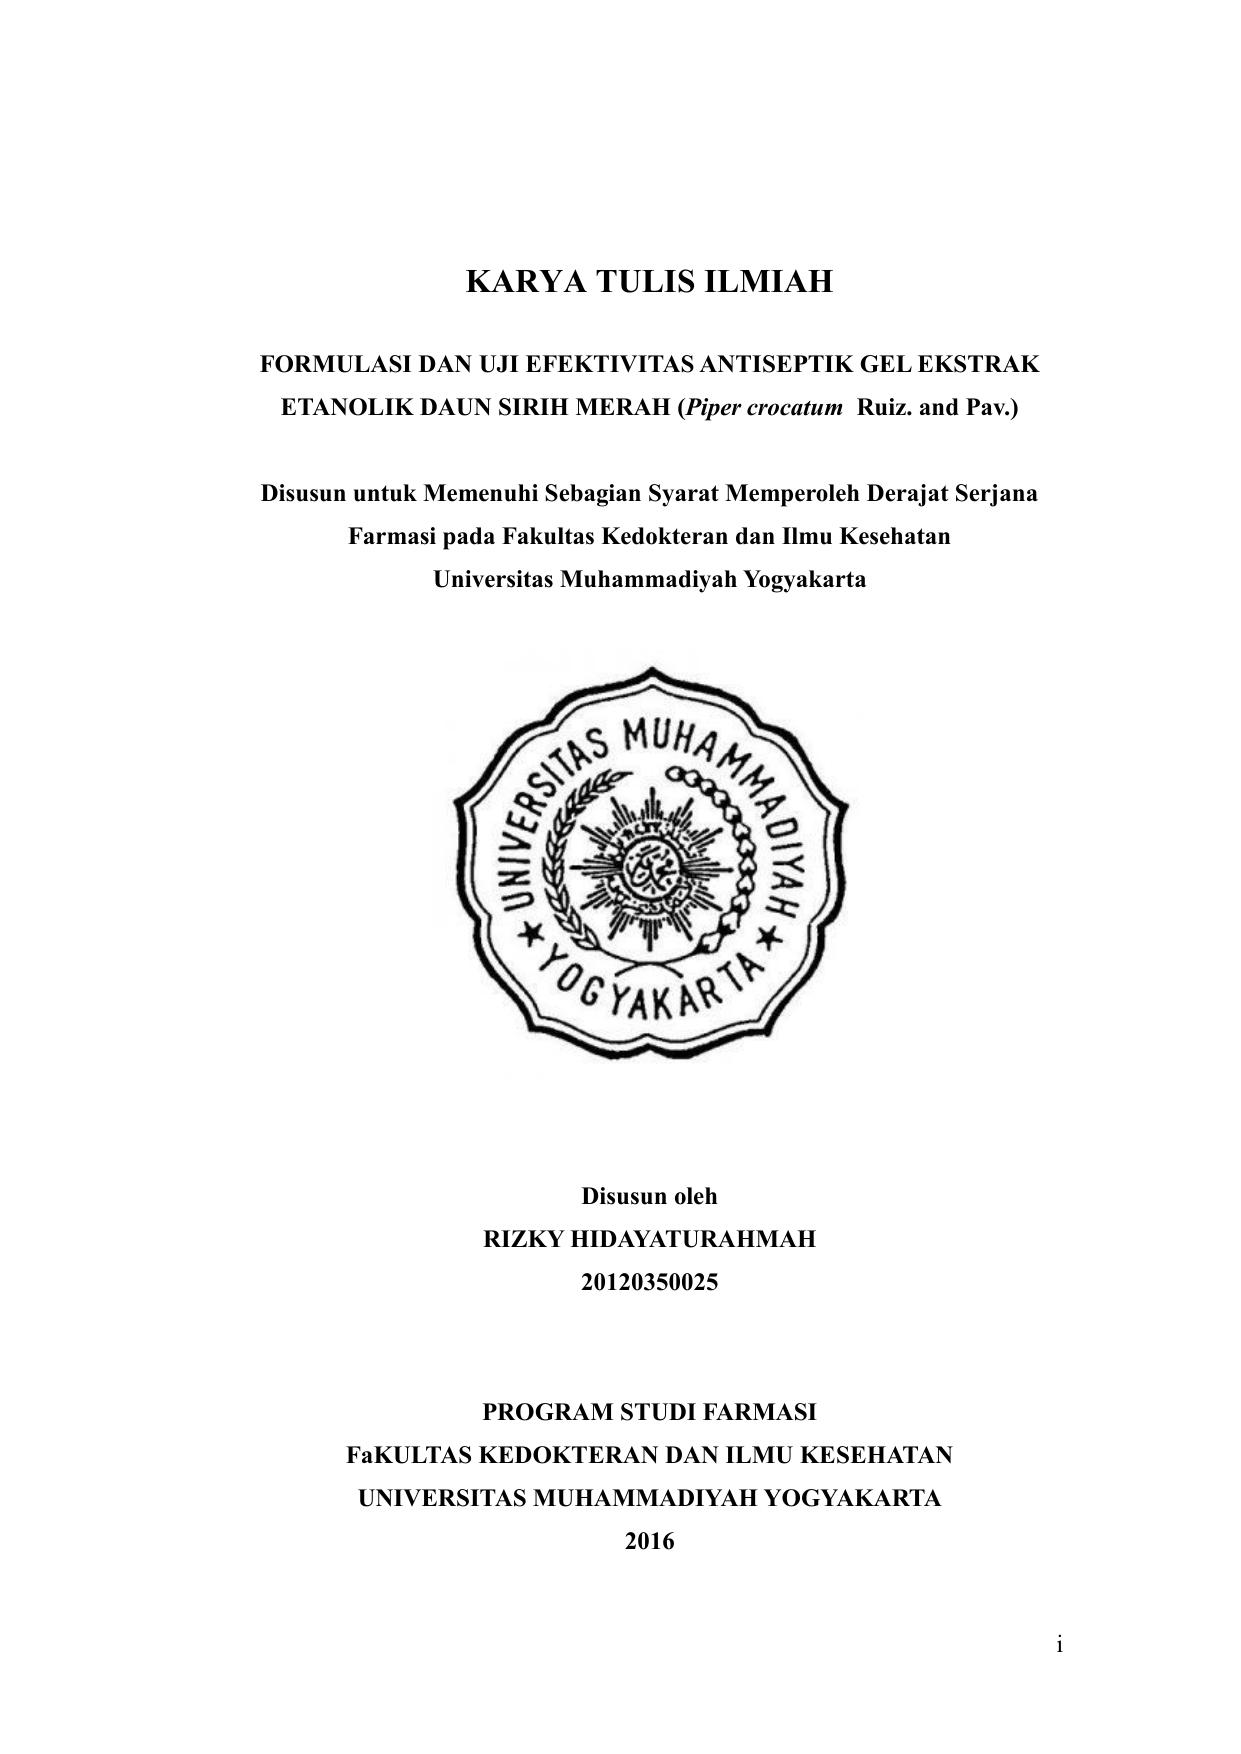 Karya Tulis Ilmiah Umy Repository